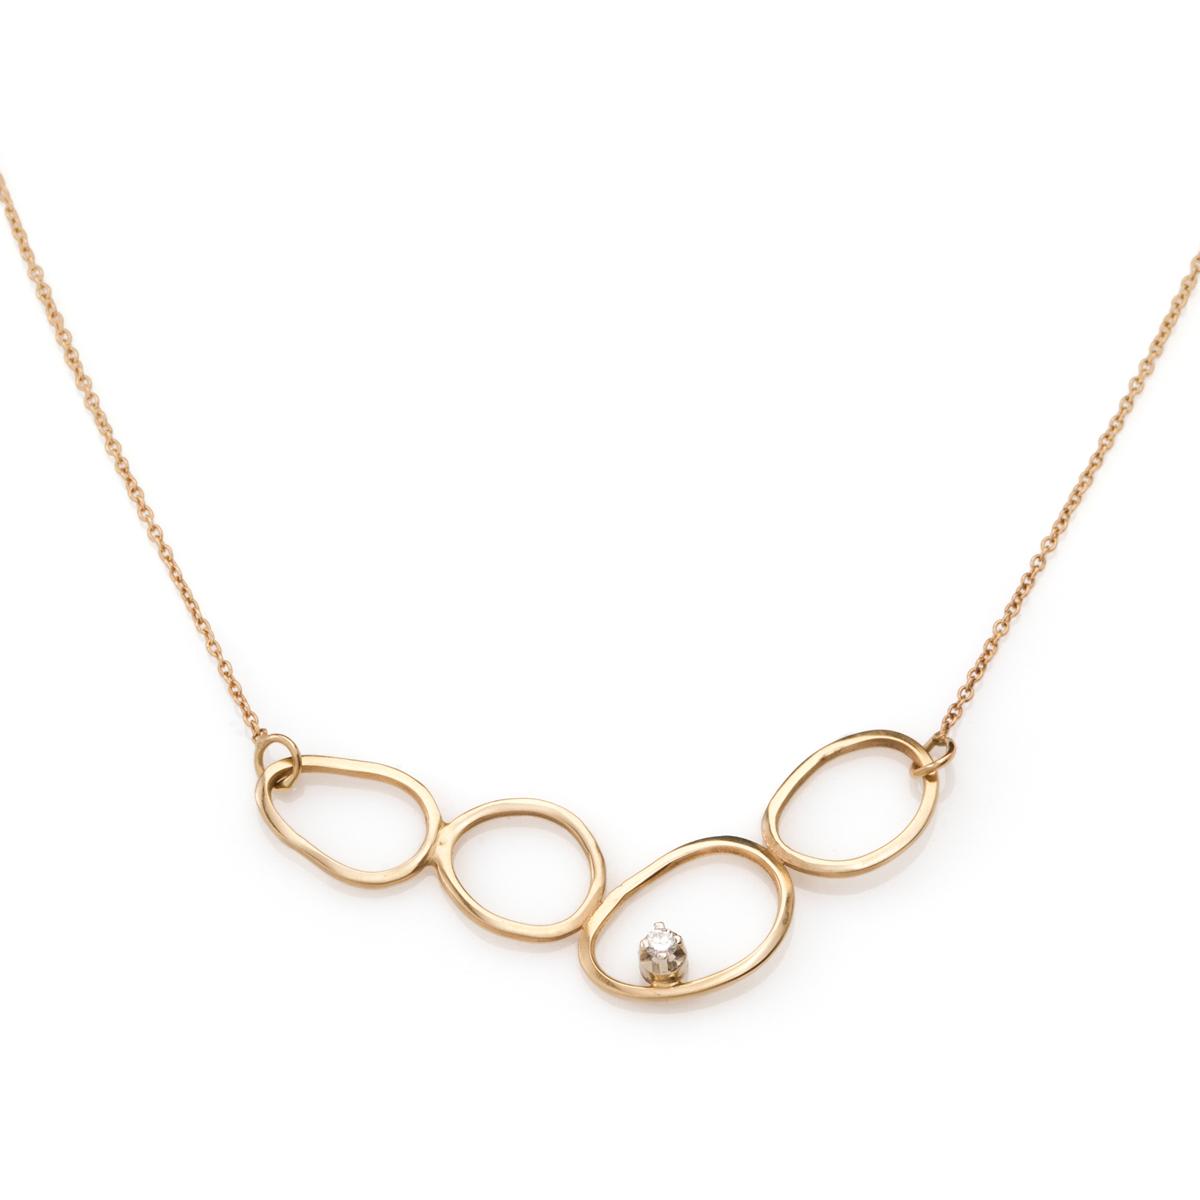 Amorphic impressive gold necklace